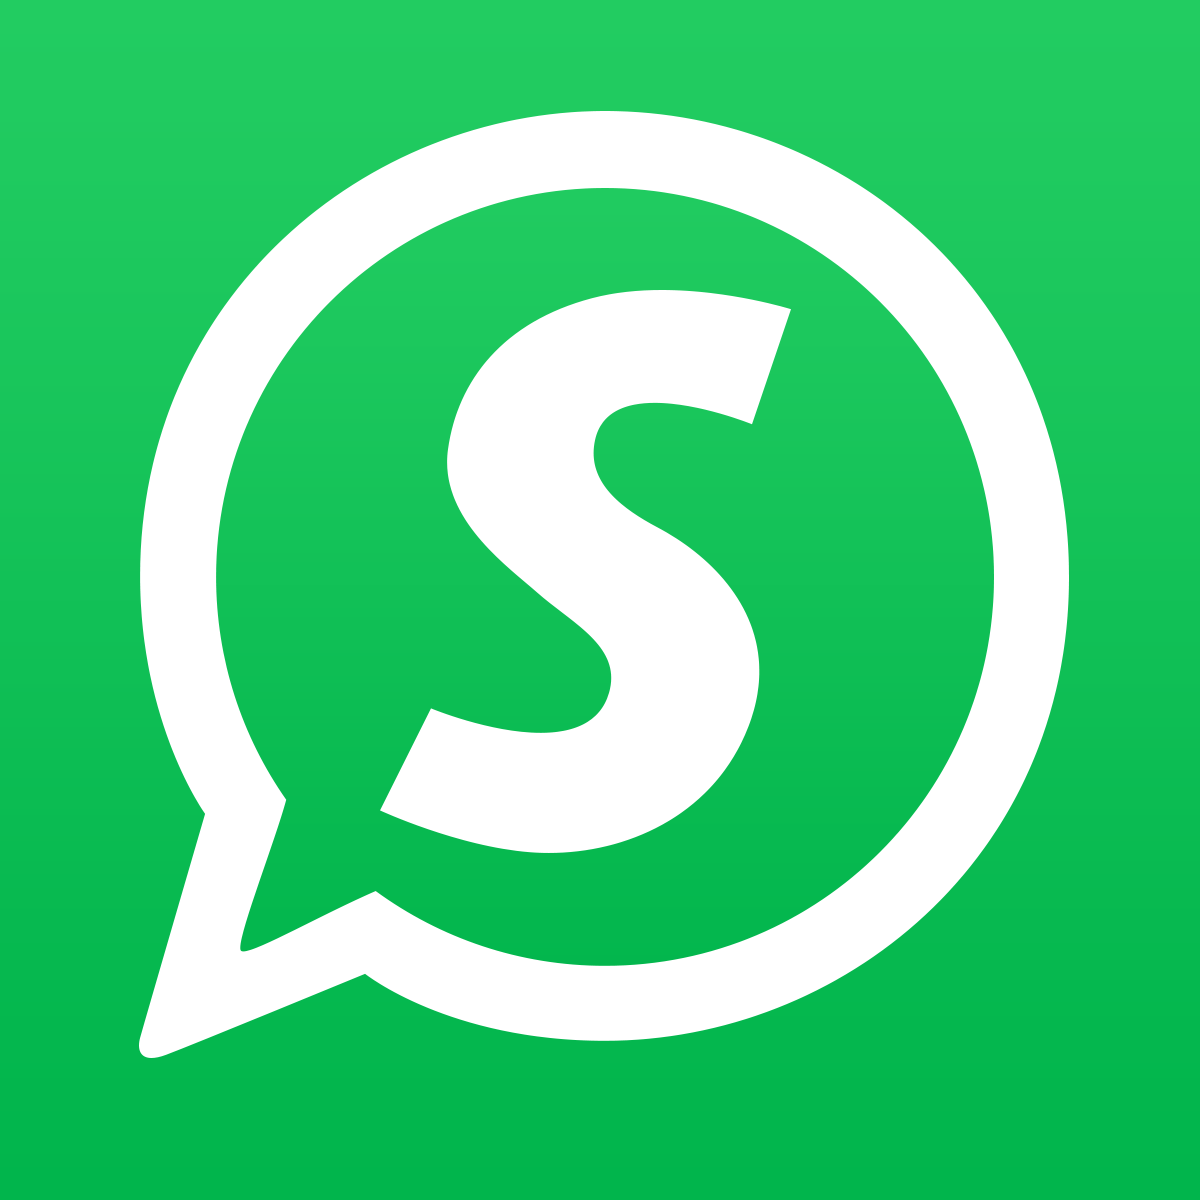 Shopify Social Share app by Kabuki themes